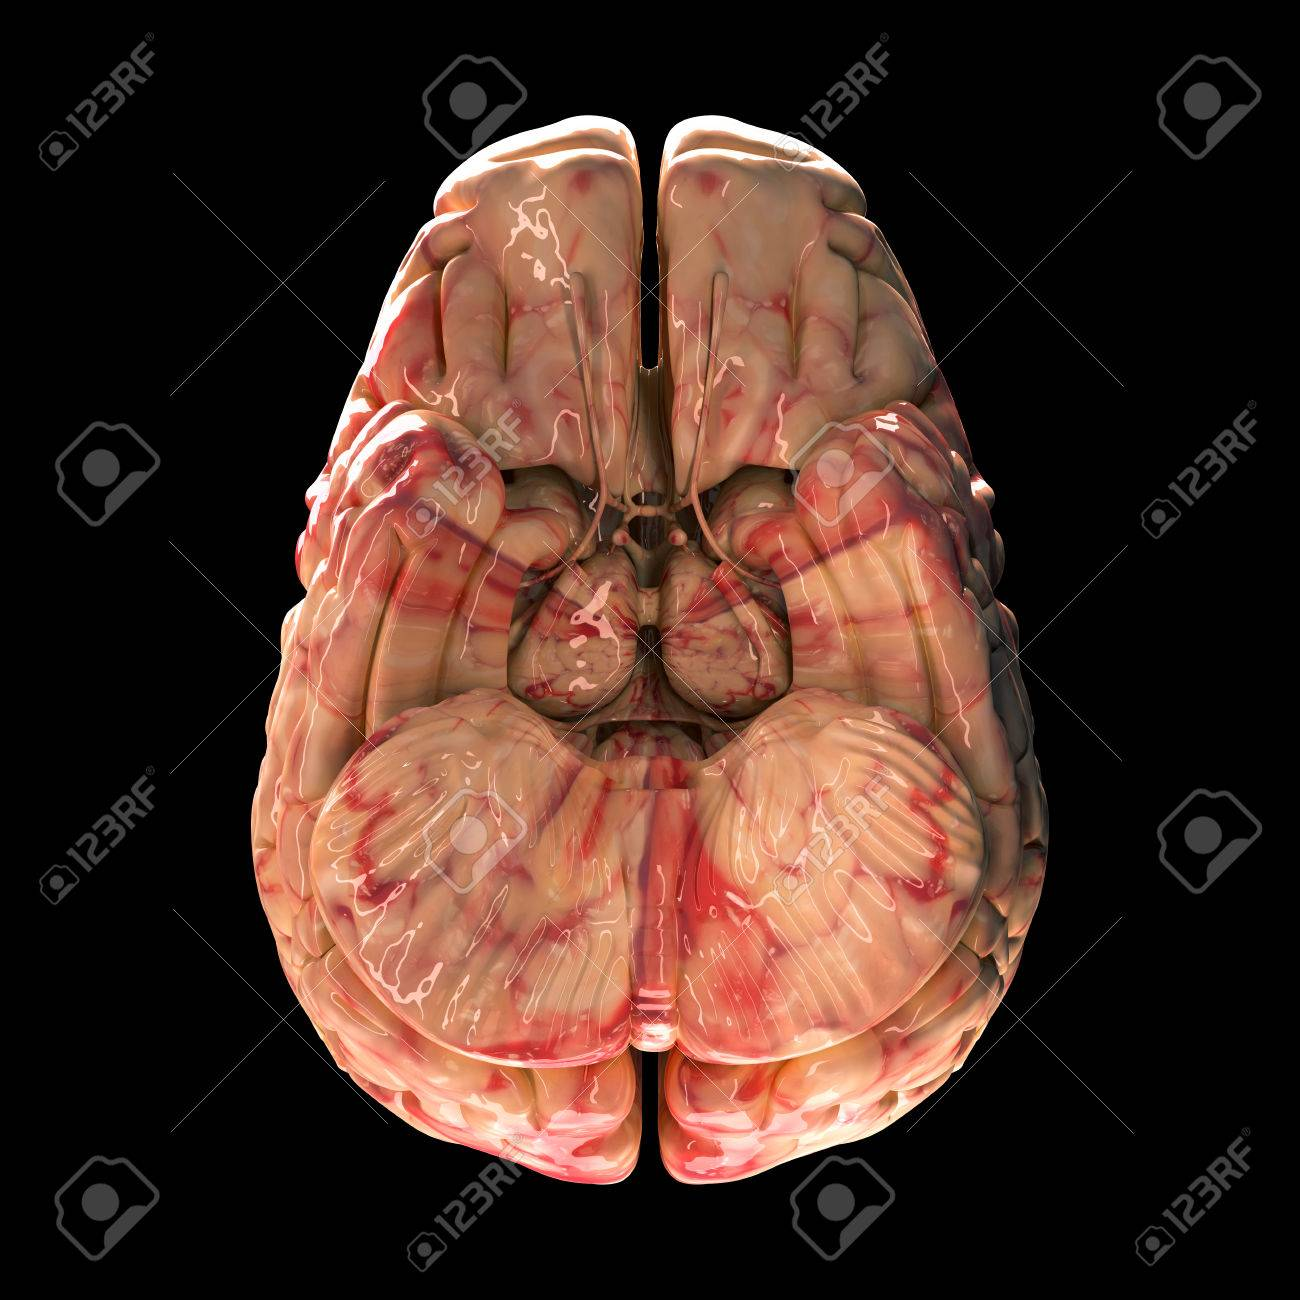 Anatomy Brain - Bottom View On Black Background Stock Photo, Picture ...